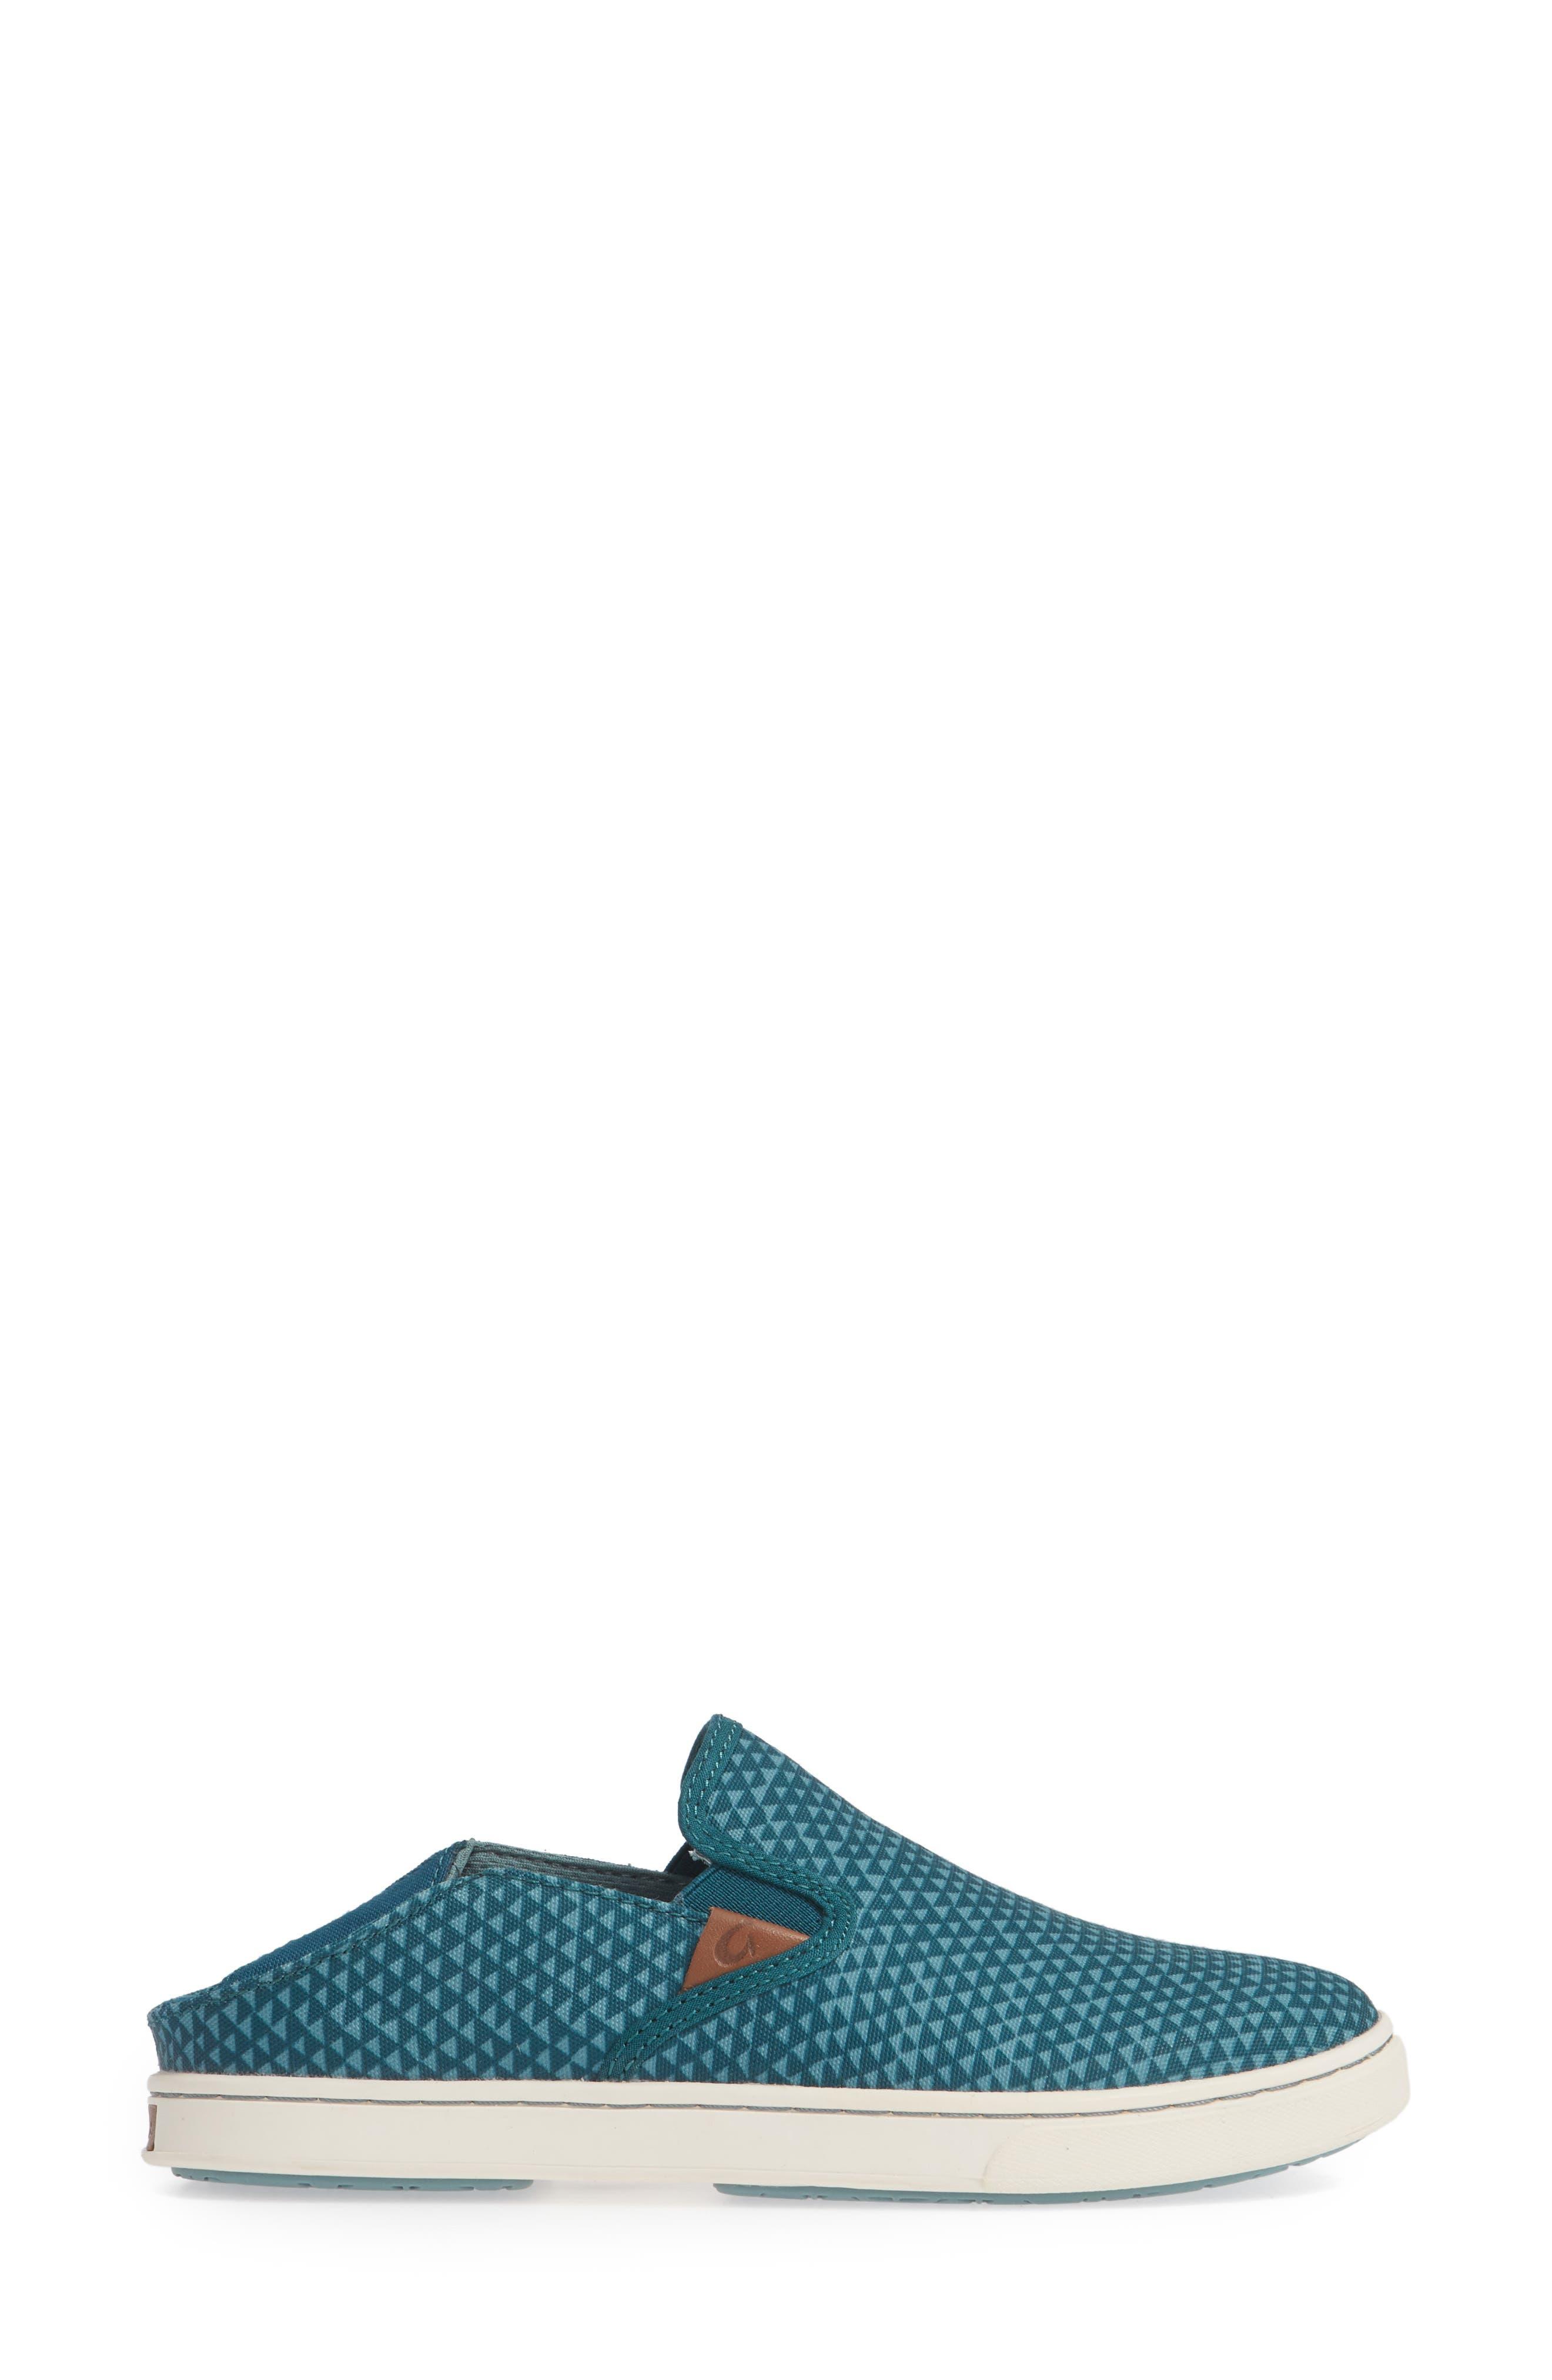 Pehuea Pa'i Convertible Sneaker,                             Alternate thumbnail 4, color,                             DEEP TEAL/ TRIANGLE FABRIC